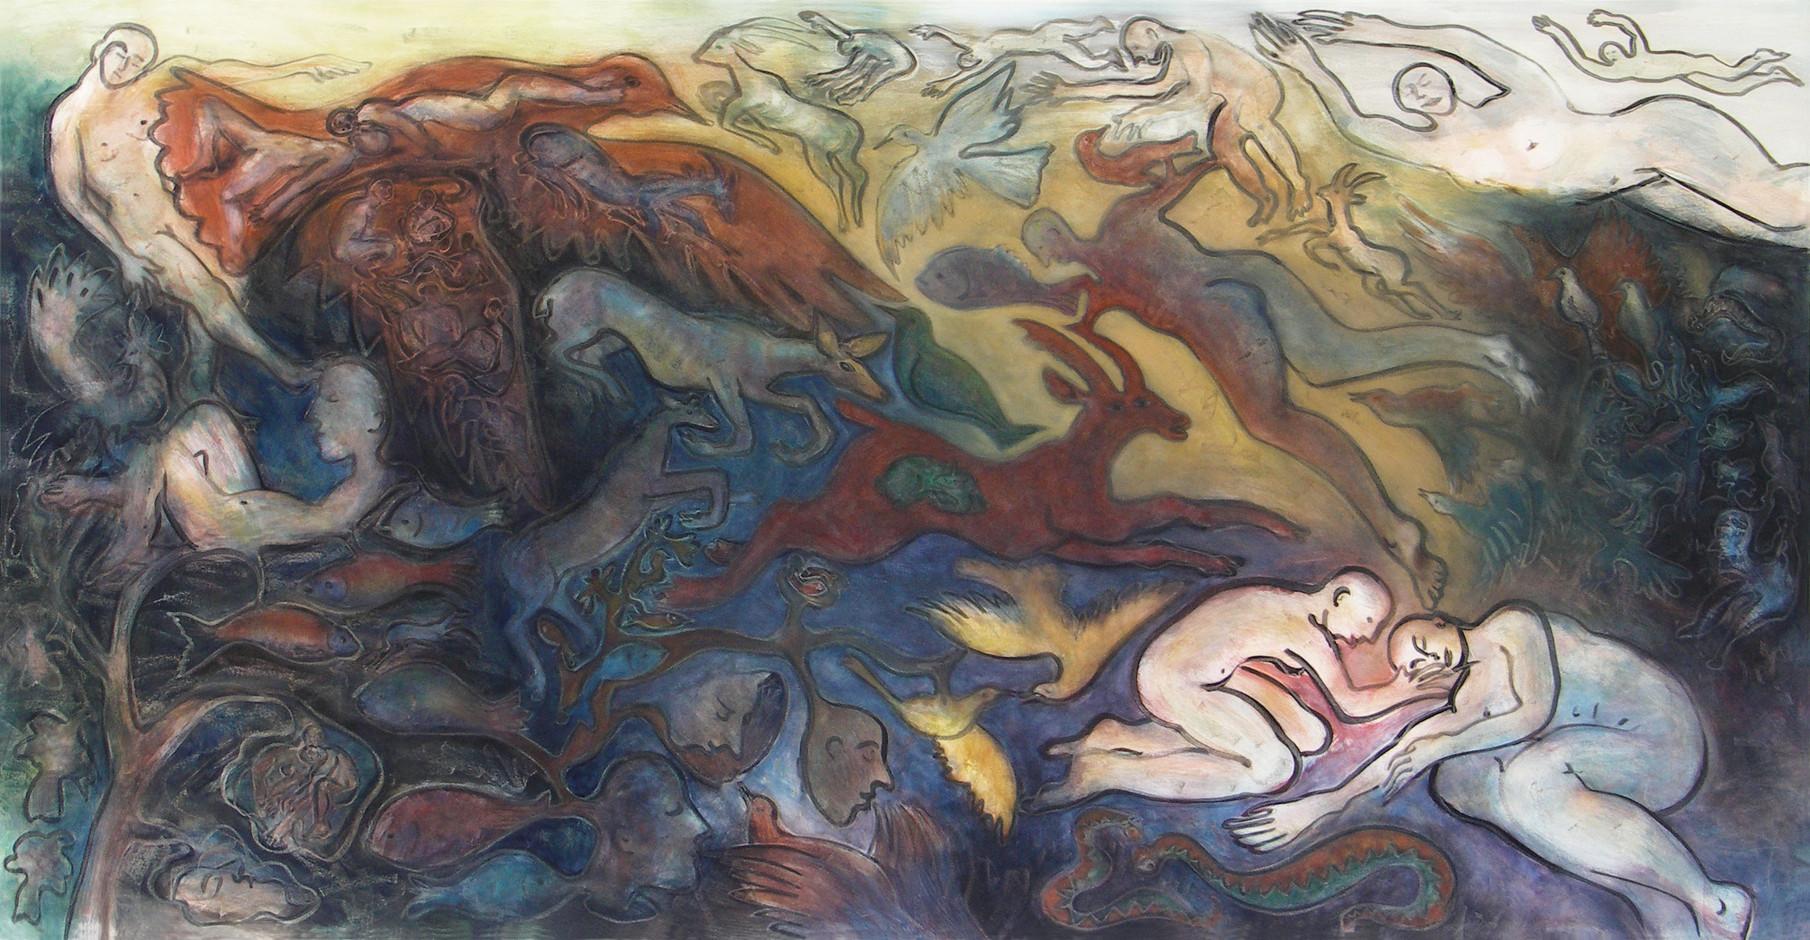 01_Geburt des Ikarus, 2004, Aquarell, 15